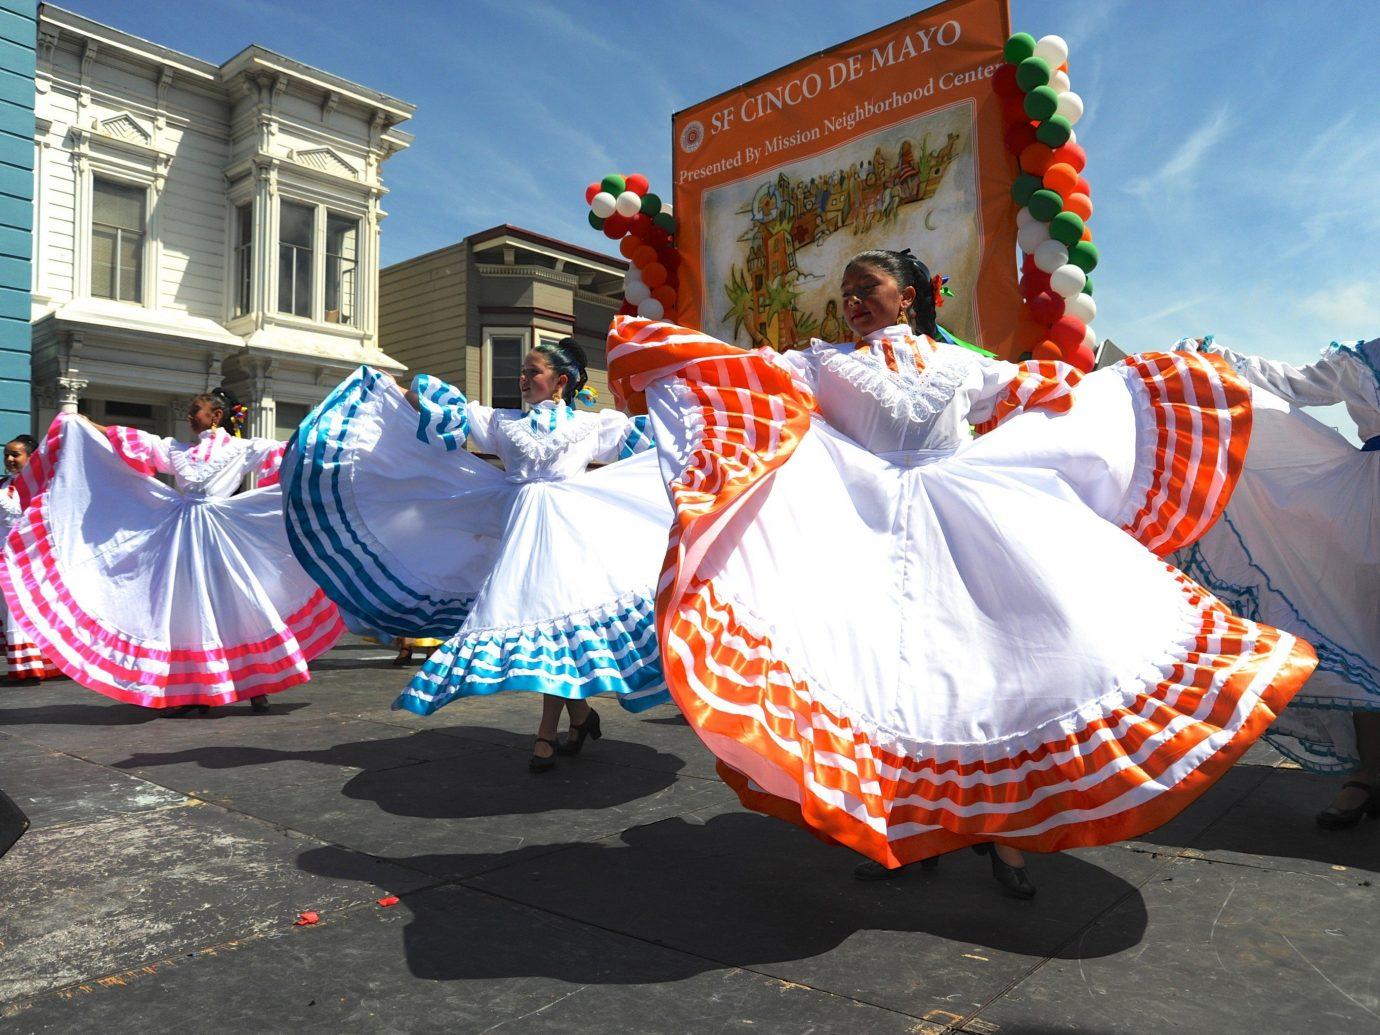 Trip Ideas outdoor dancer Sport performance art performing arts folk dance event festival dance carnival tradition sports